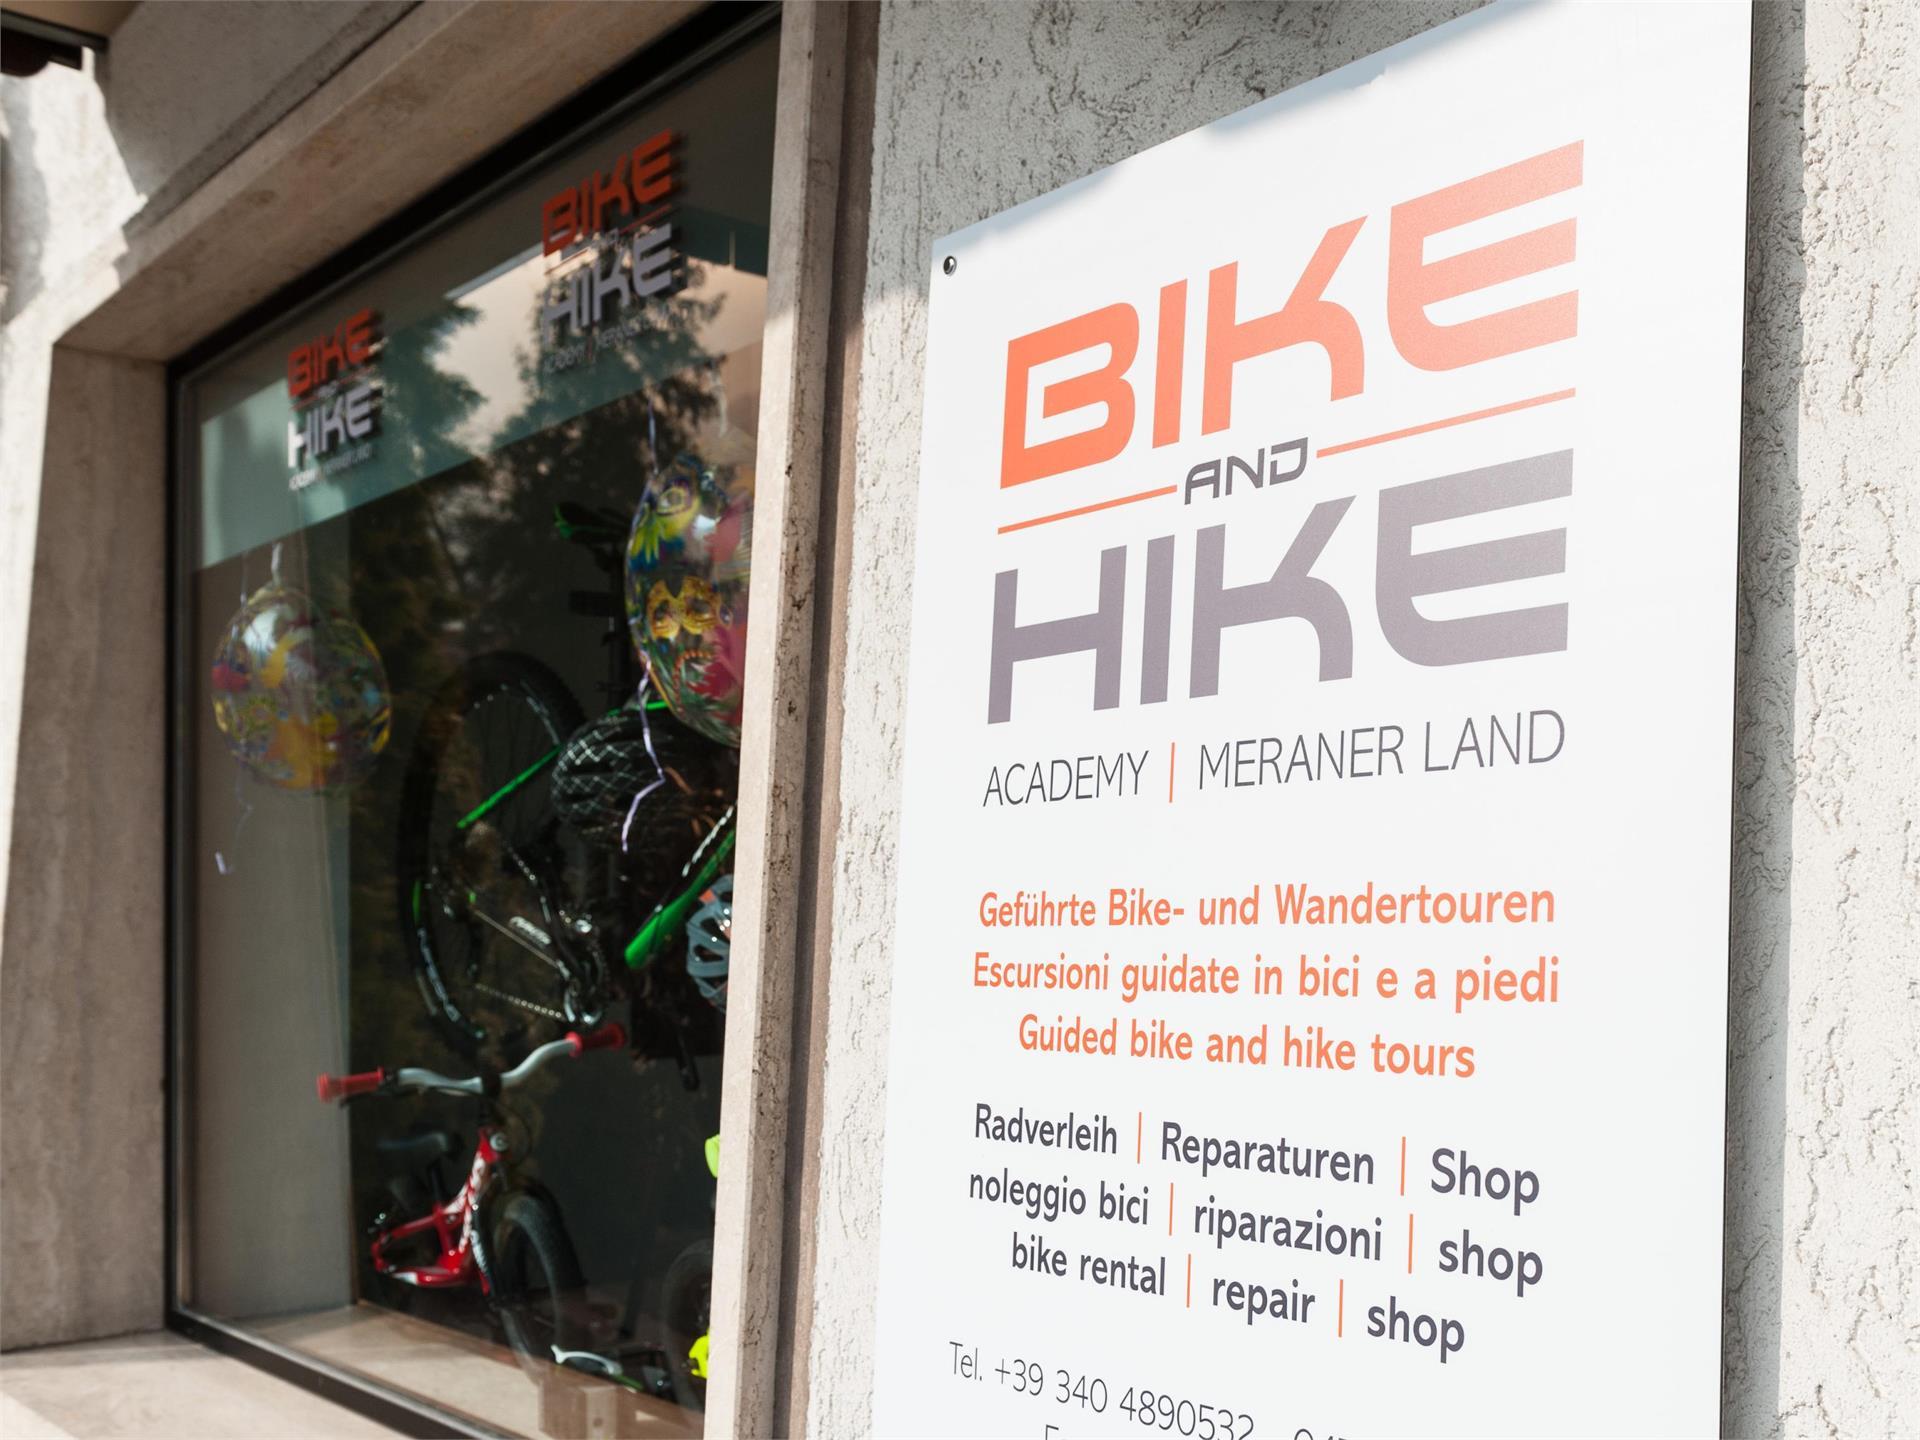 Bike and Hike Academy Meraner Land